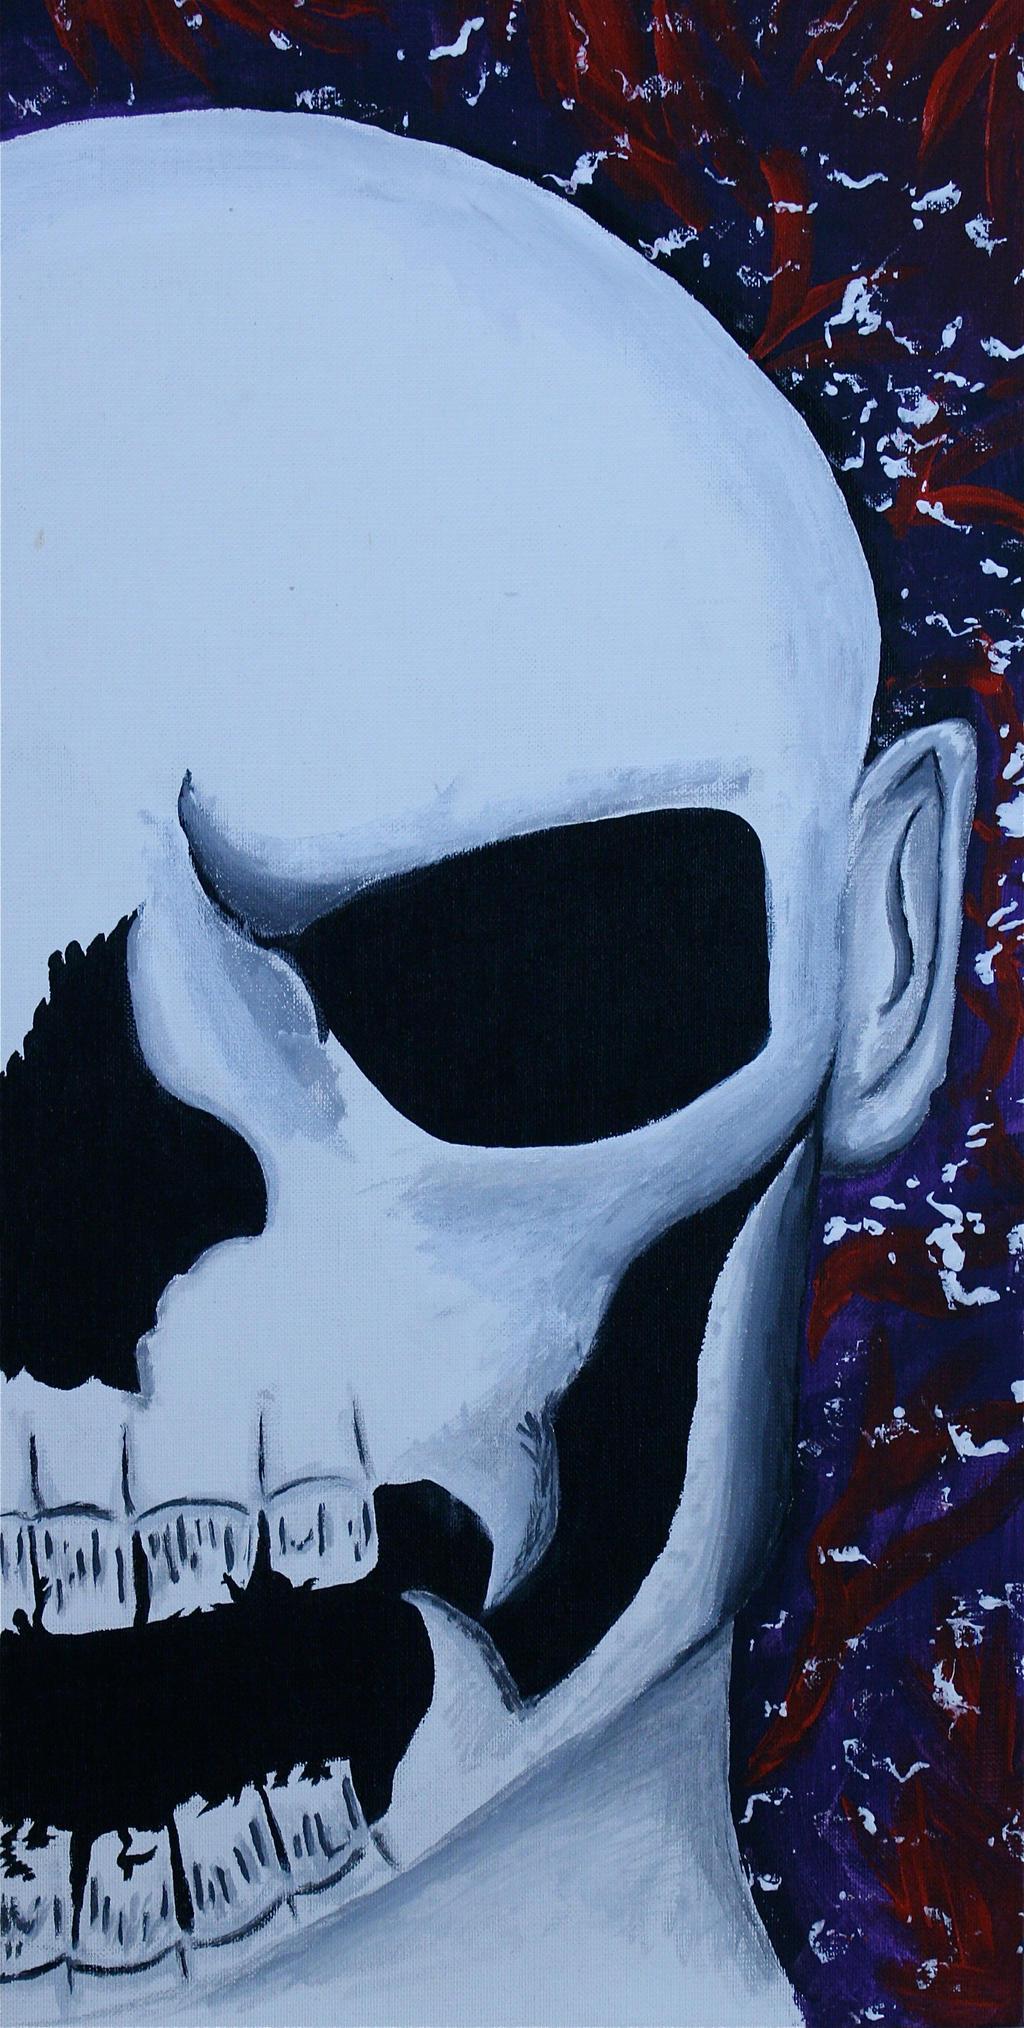 SkullFace by zoinkscameron